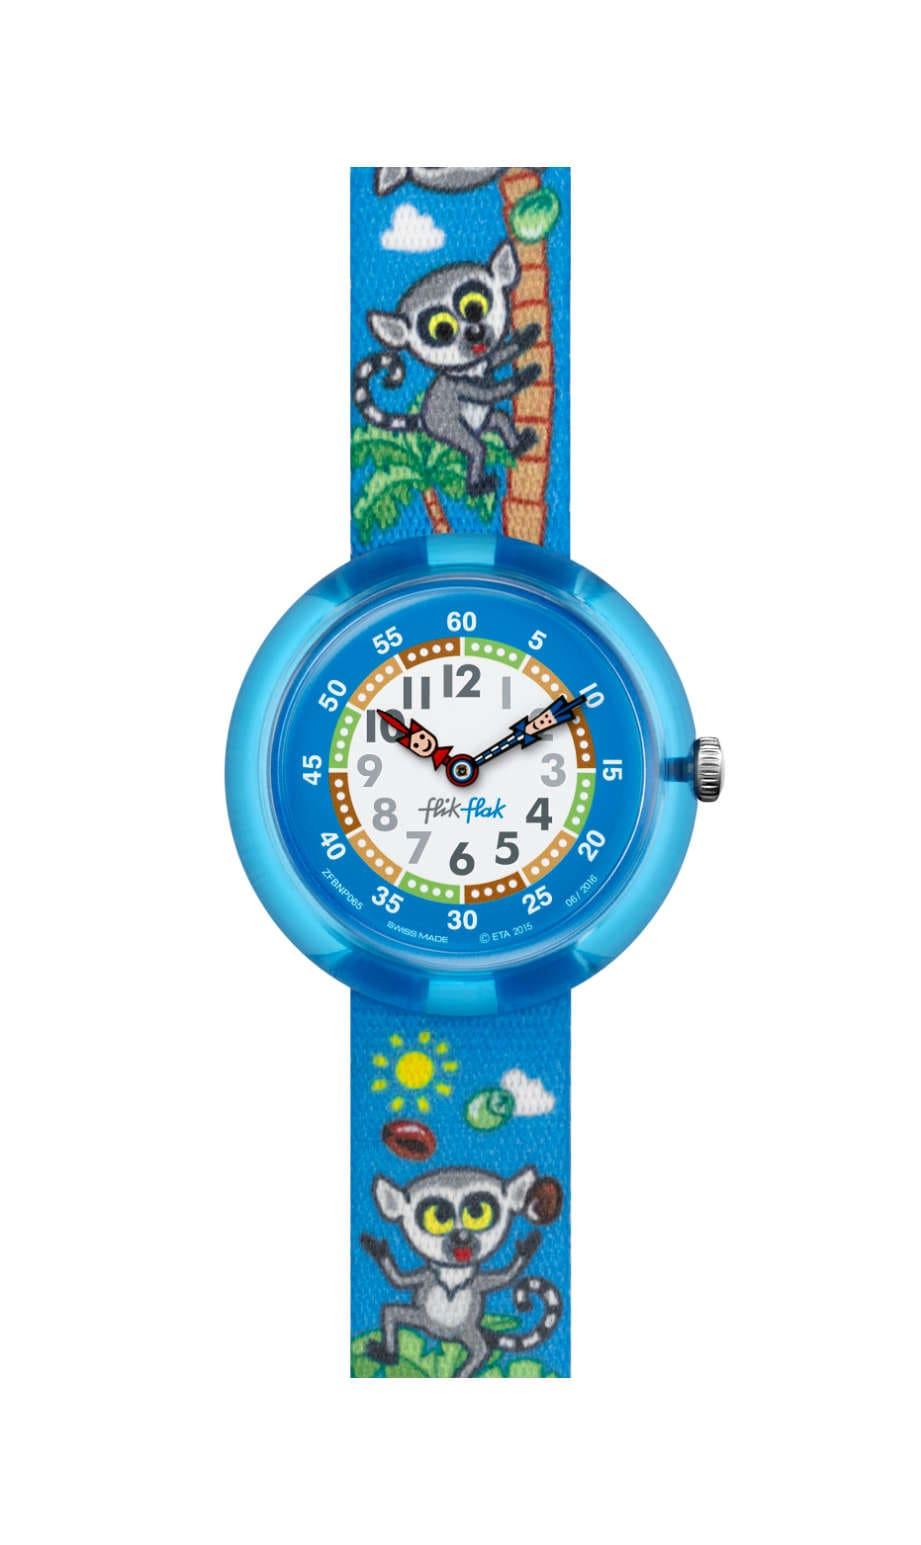 Swatch - GIDRO - 1